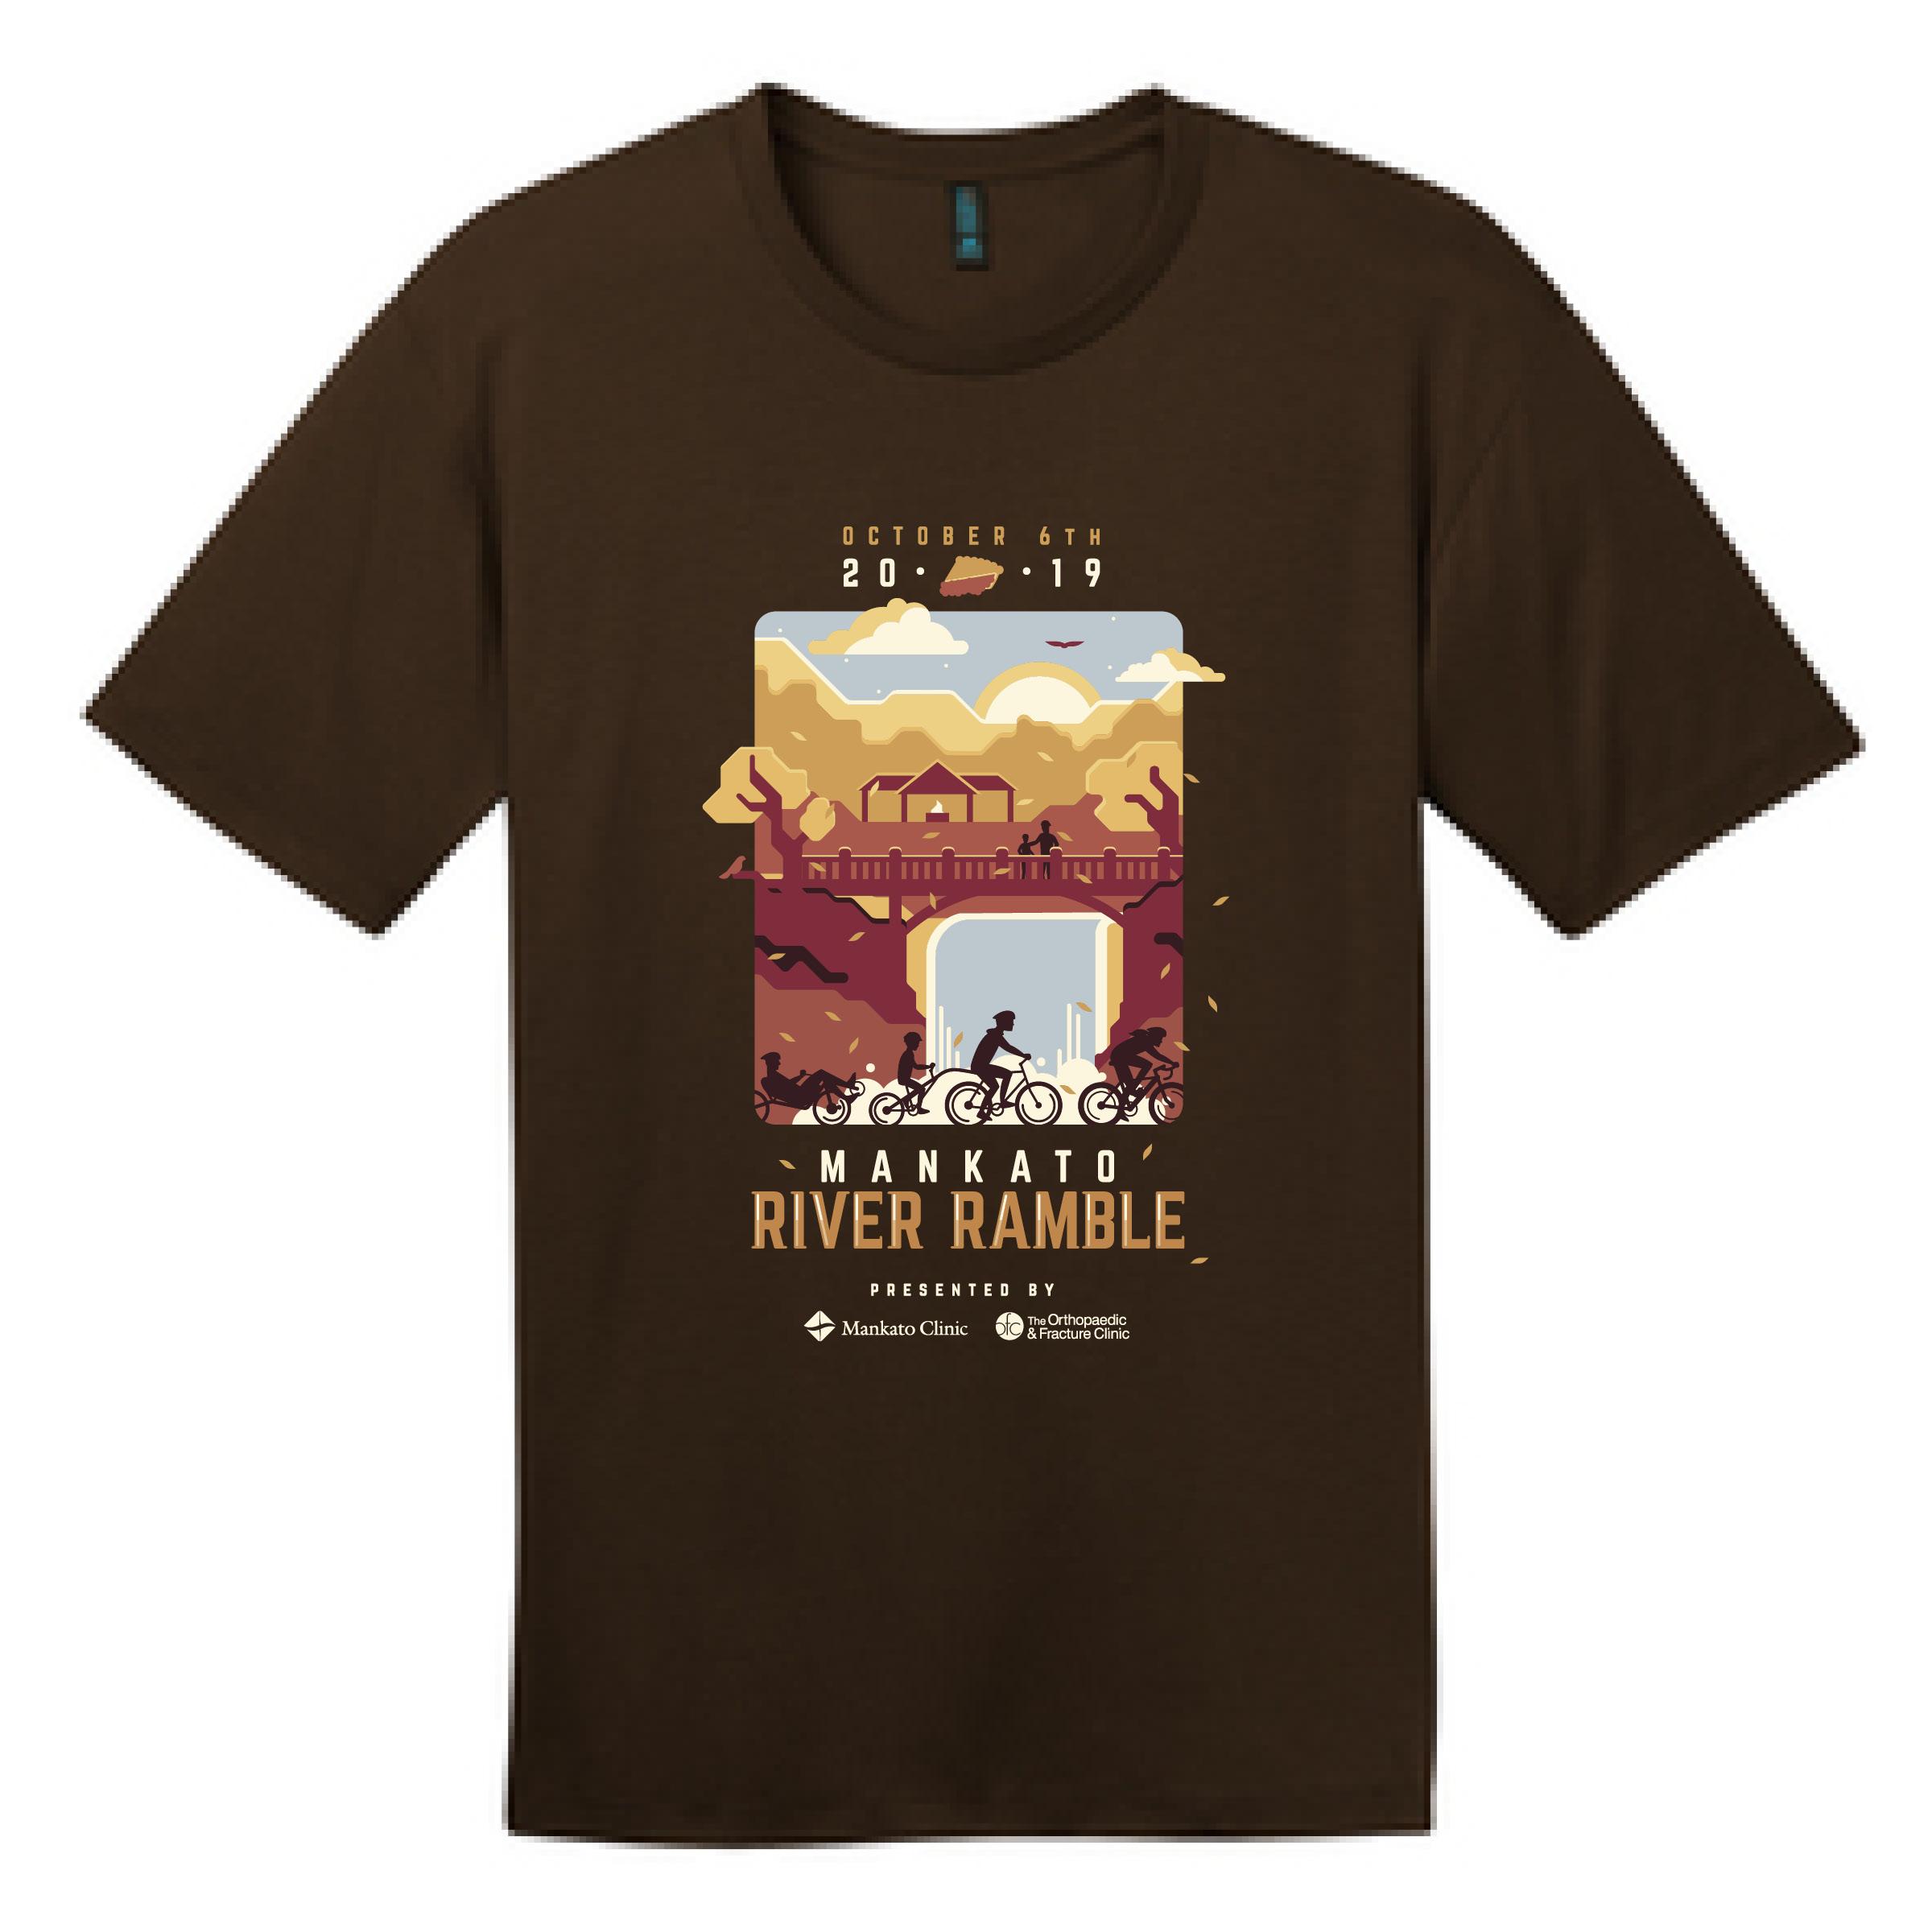 A mockup image of the 2019 Mankato River Ramble t-shirt.